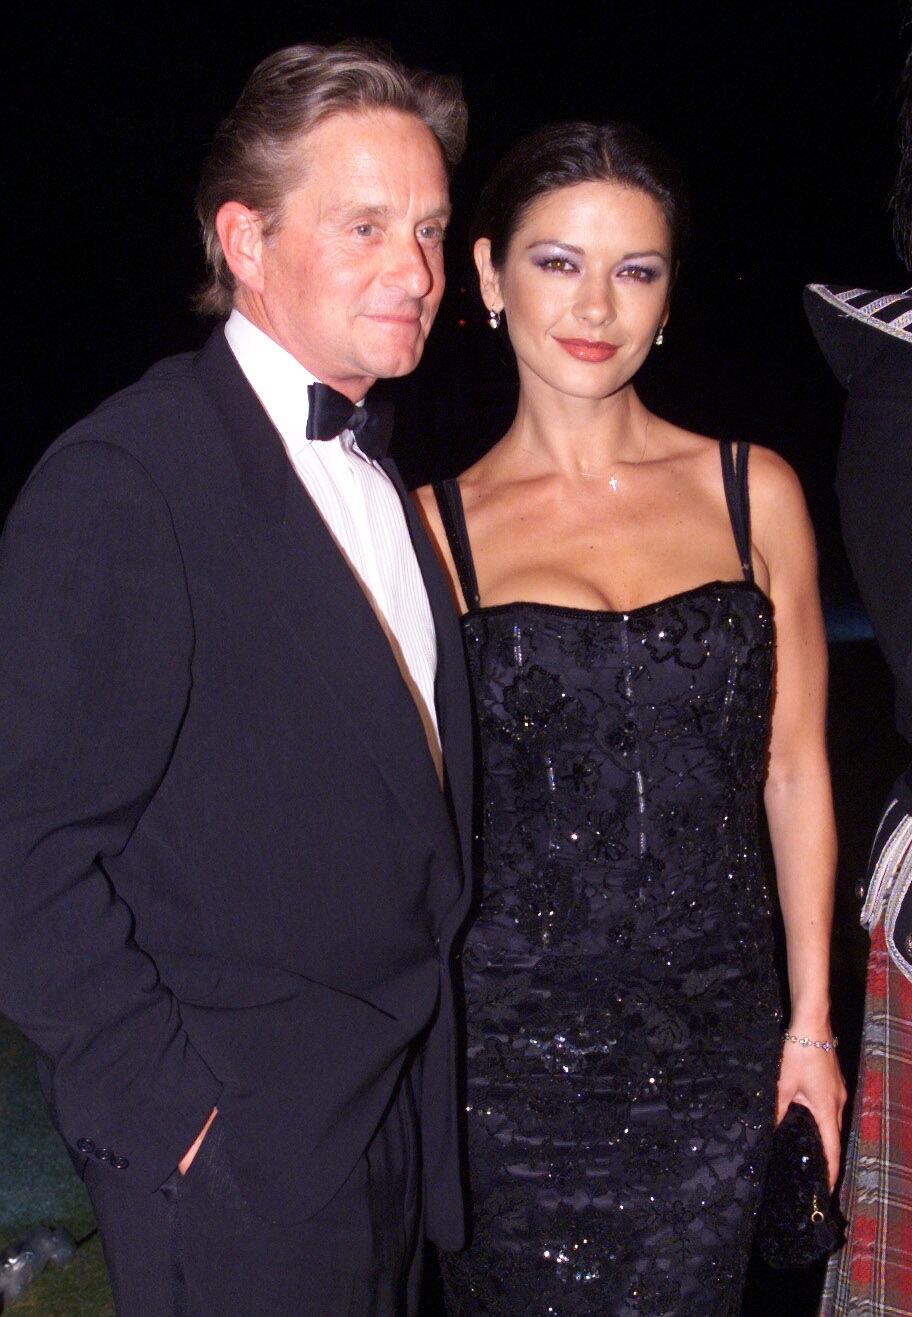 Catherine Zeta Jones and Michael Douglas at 'Entrapment' premiere